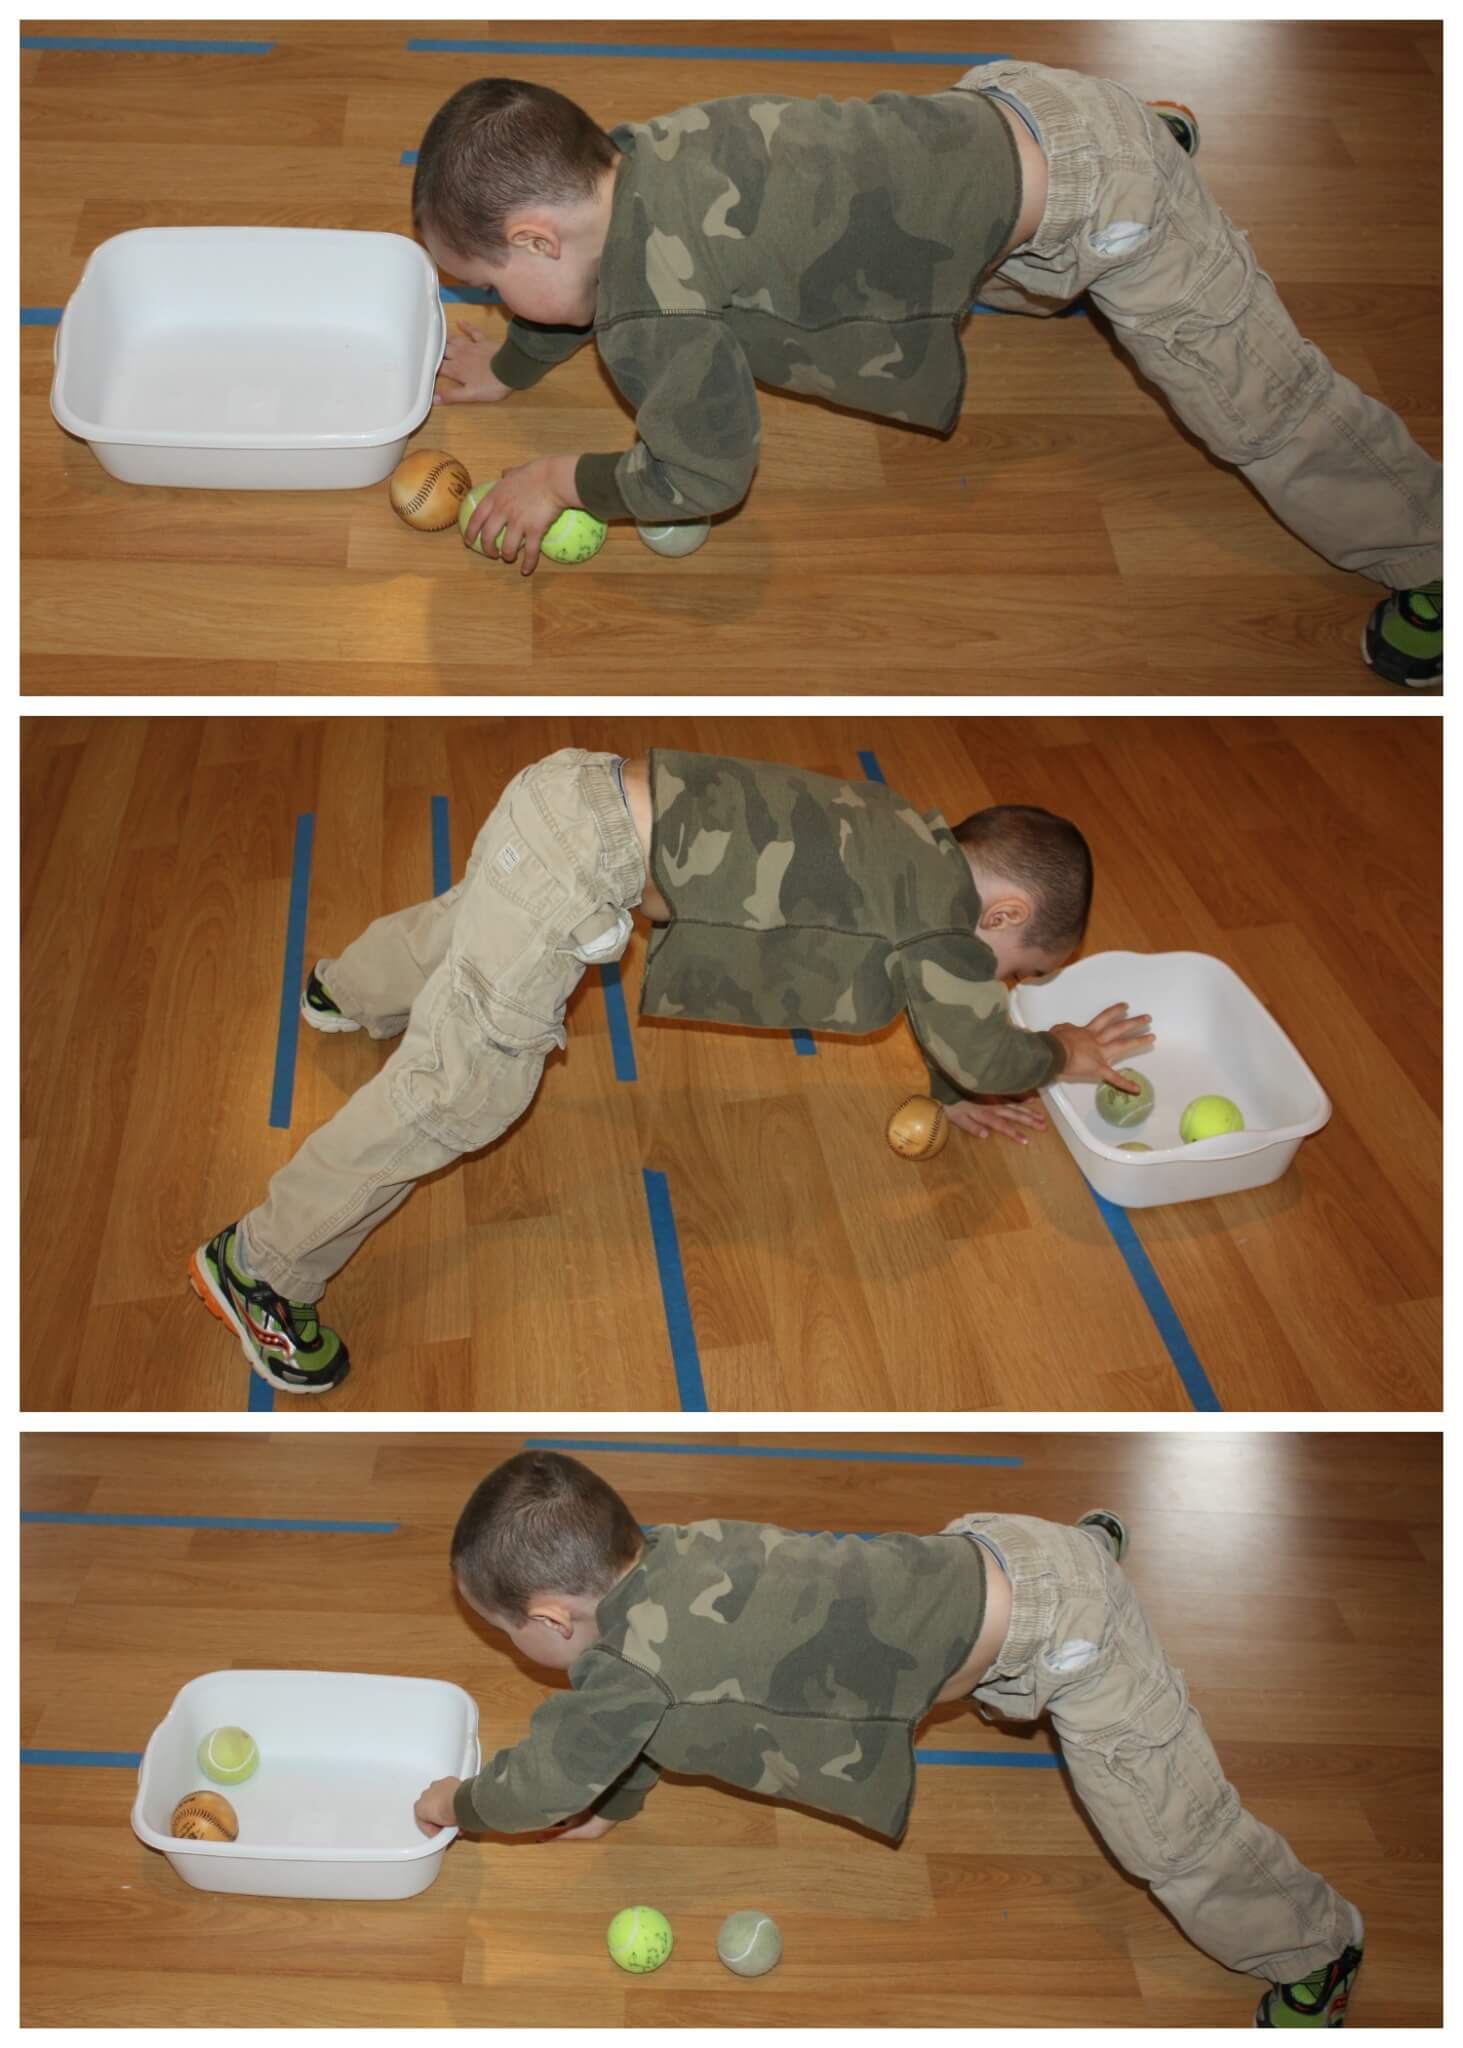 Vestibular Sensory Play Tennis Ball Games For Kids